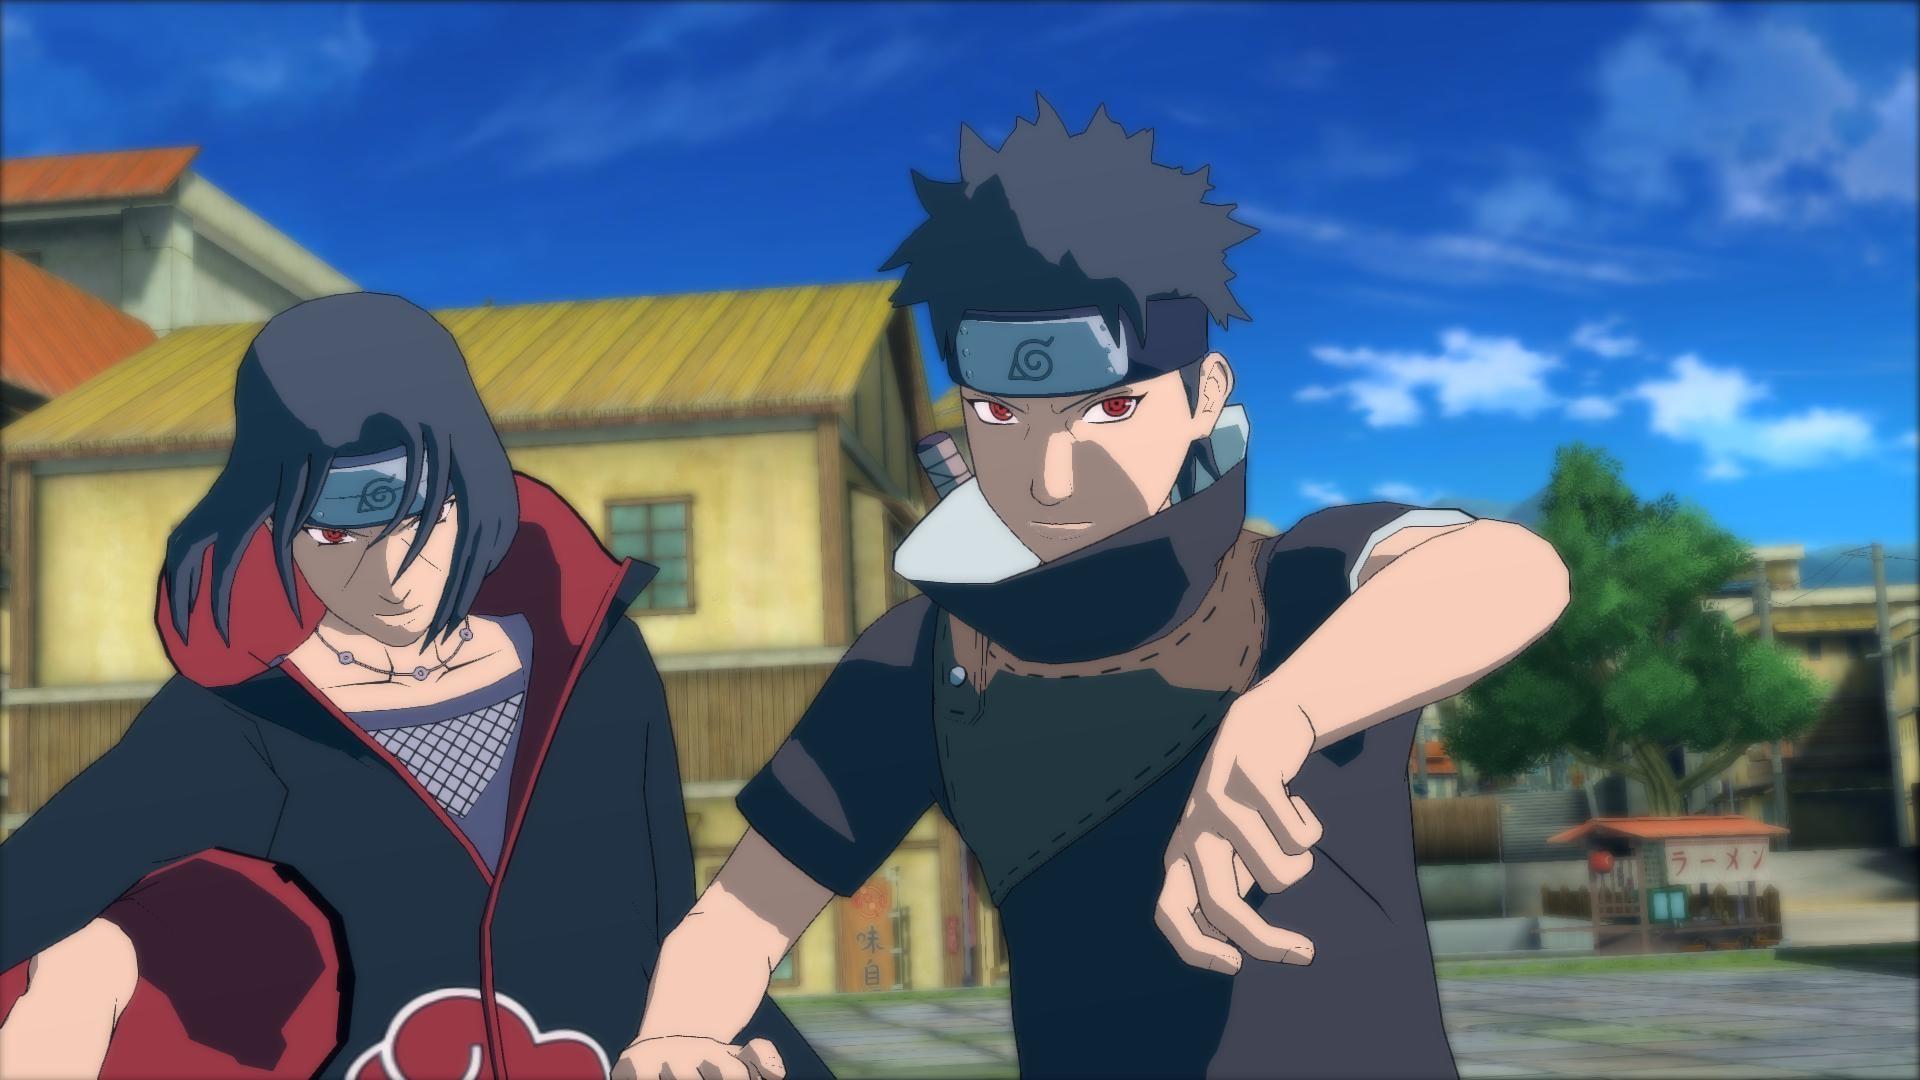 Video Game – Naruto Shippuden: Ultimate Ninja Storm 4 Shisui Uchiha Itachi Uchiha  Wallpaper